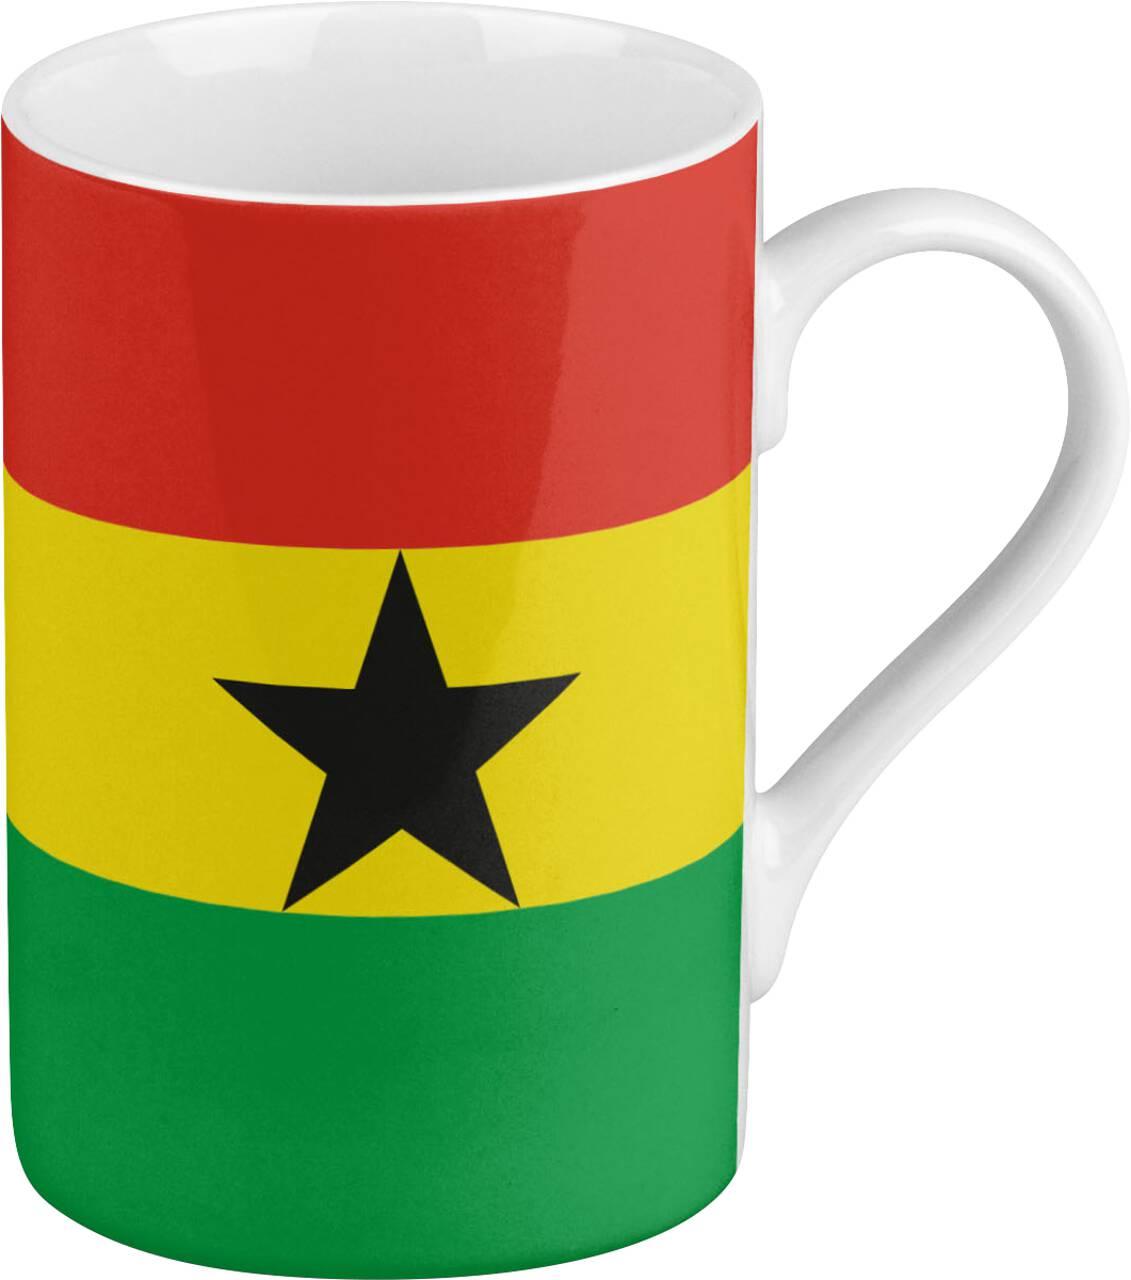 Kaffeebecher mit Motiv Ghanaflagge